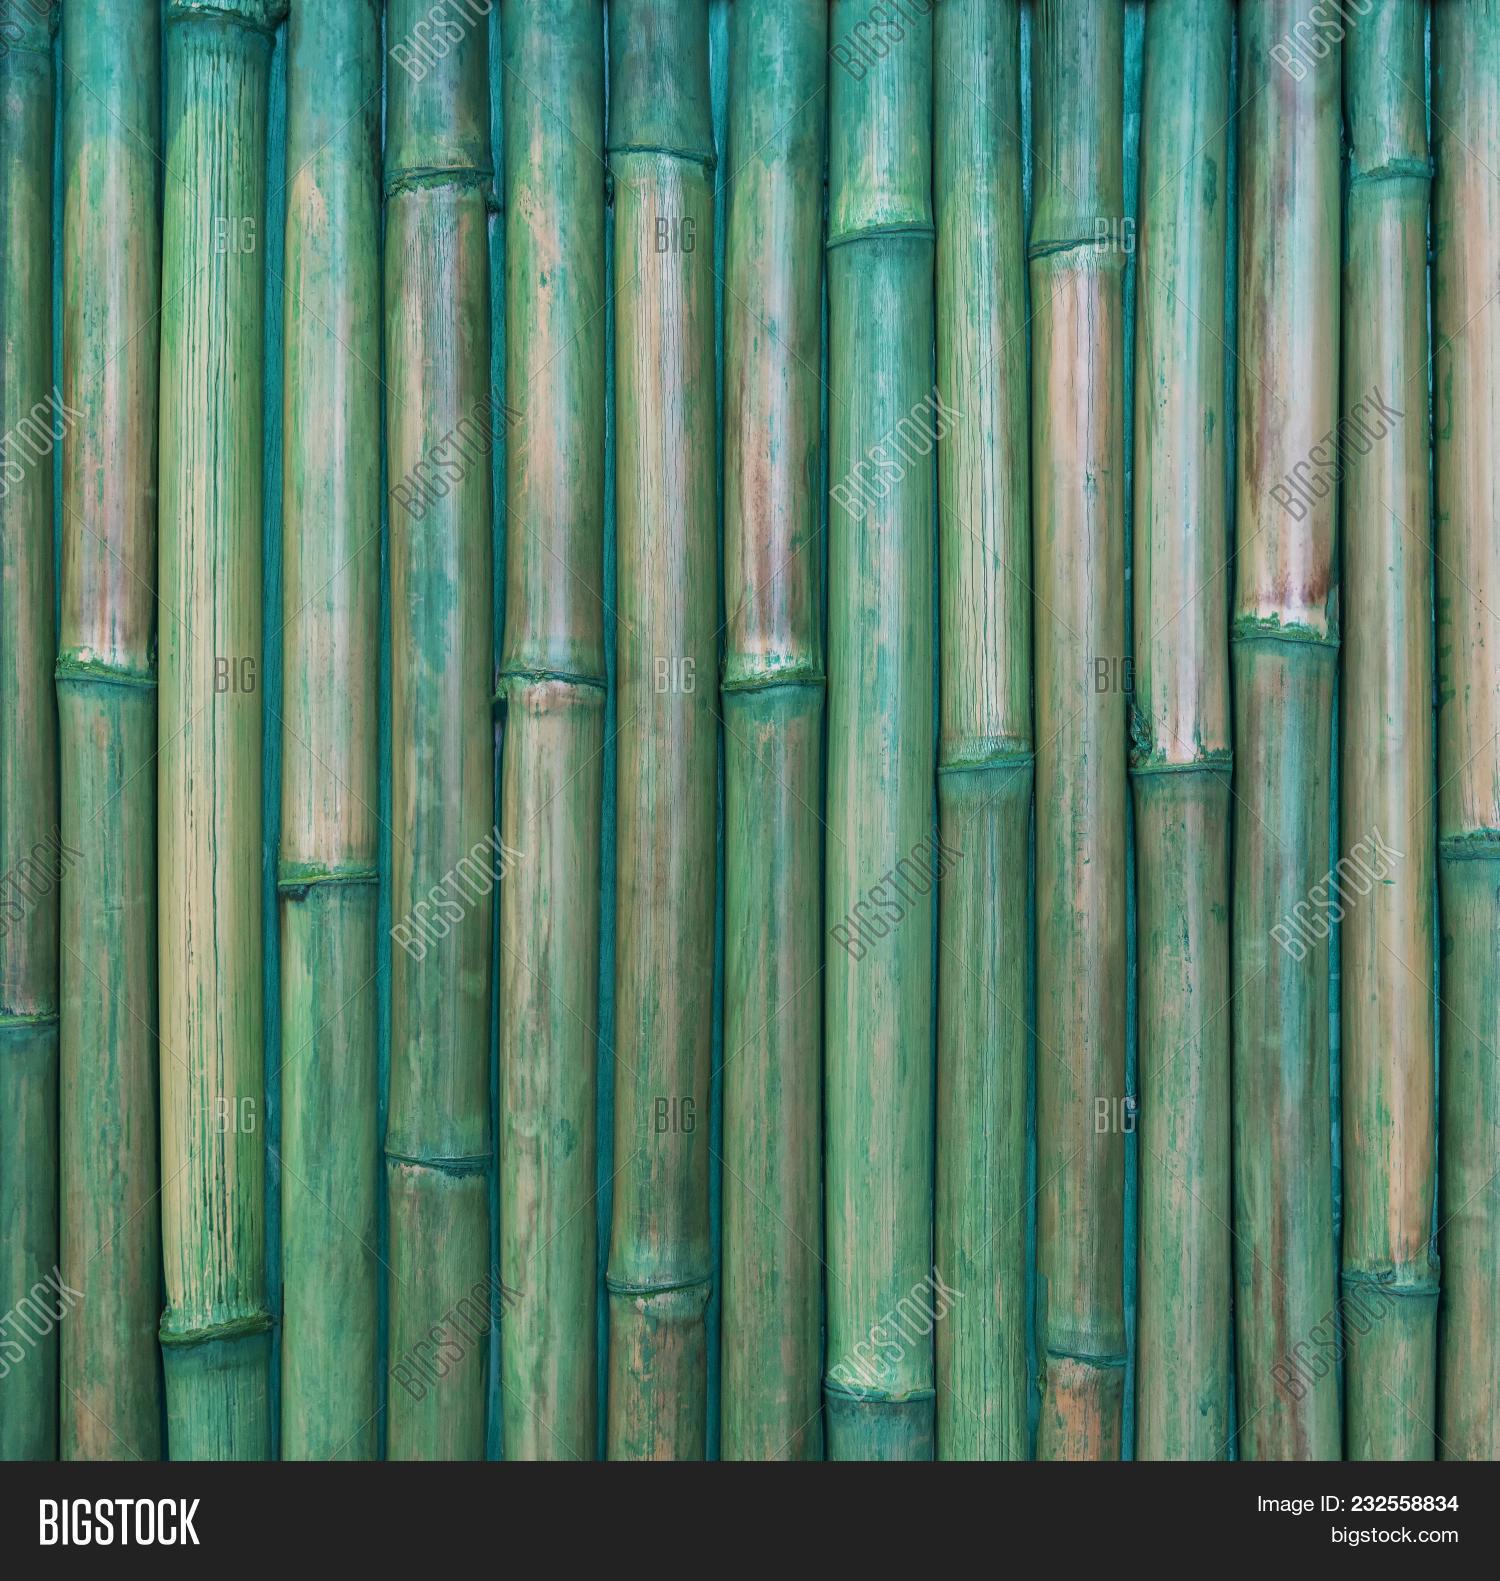 Abstract Background Bamboo Pattern Image & Photo | Bigstock